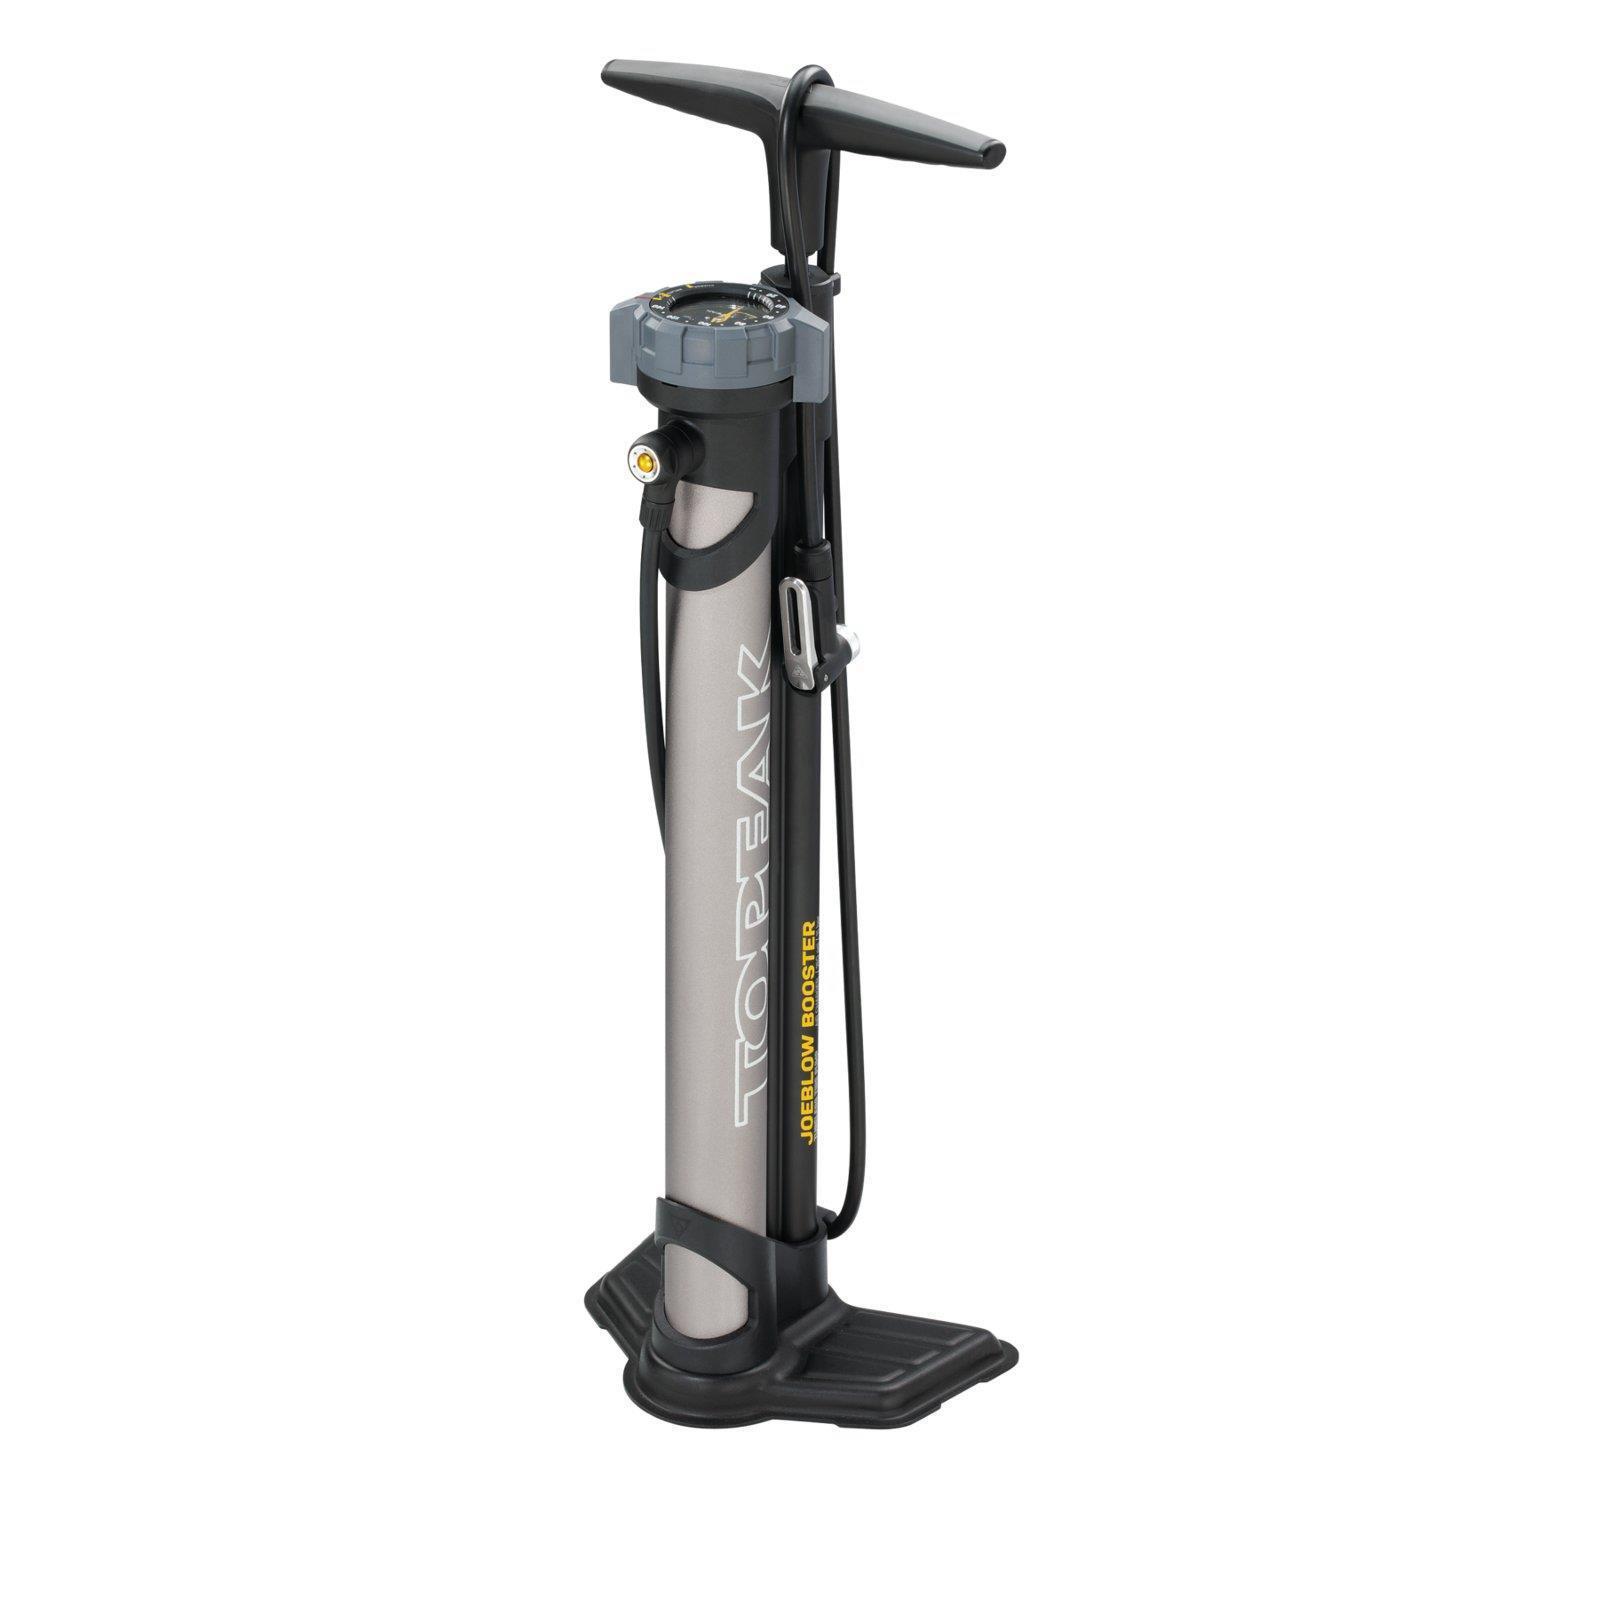 Topeak JoeBlow Booster Luftpumpe Tubeless Standpumpe Fahrrad Luftpumpe Booster Presta Schrader 9eeb4f